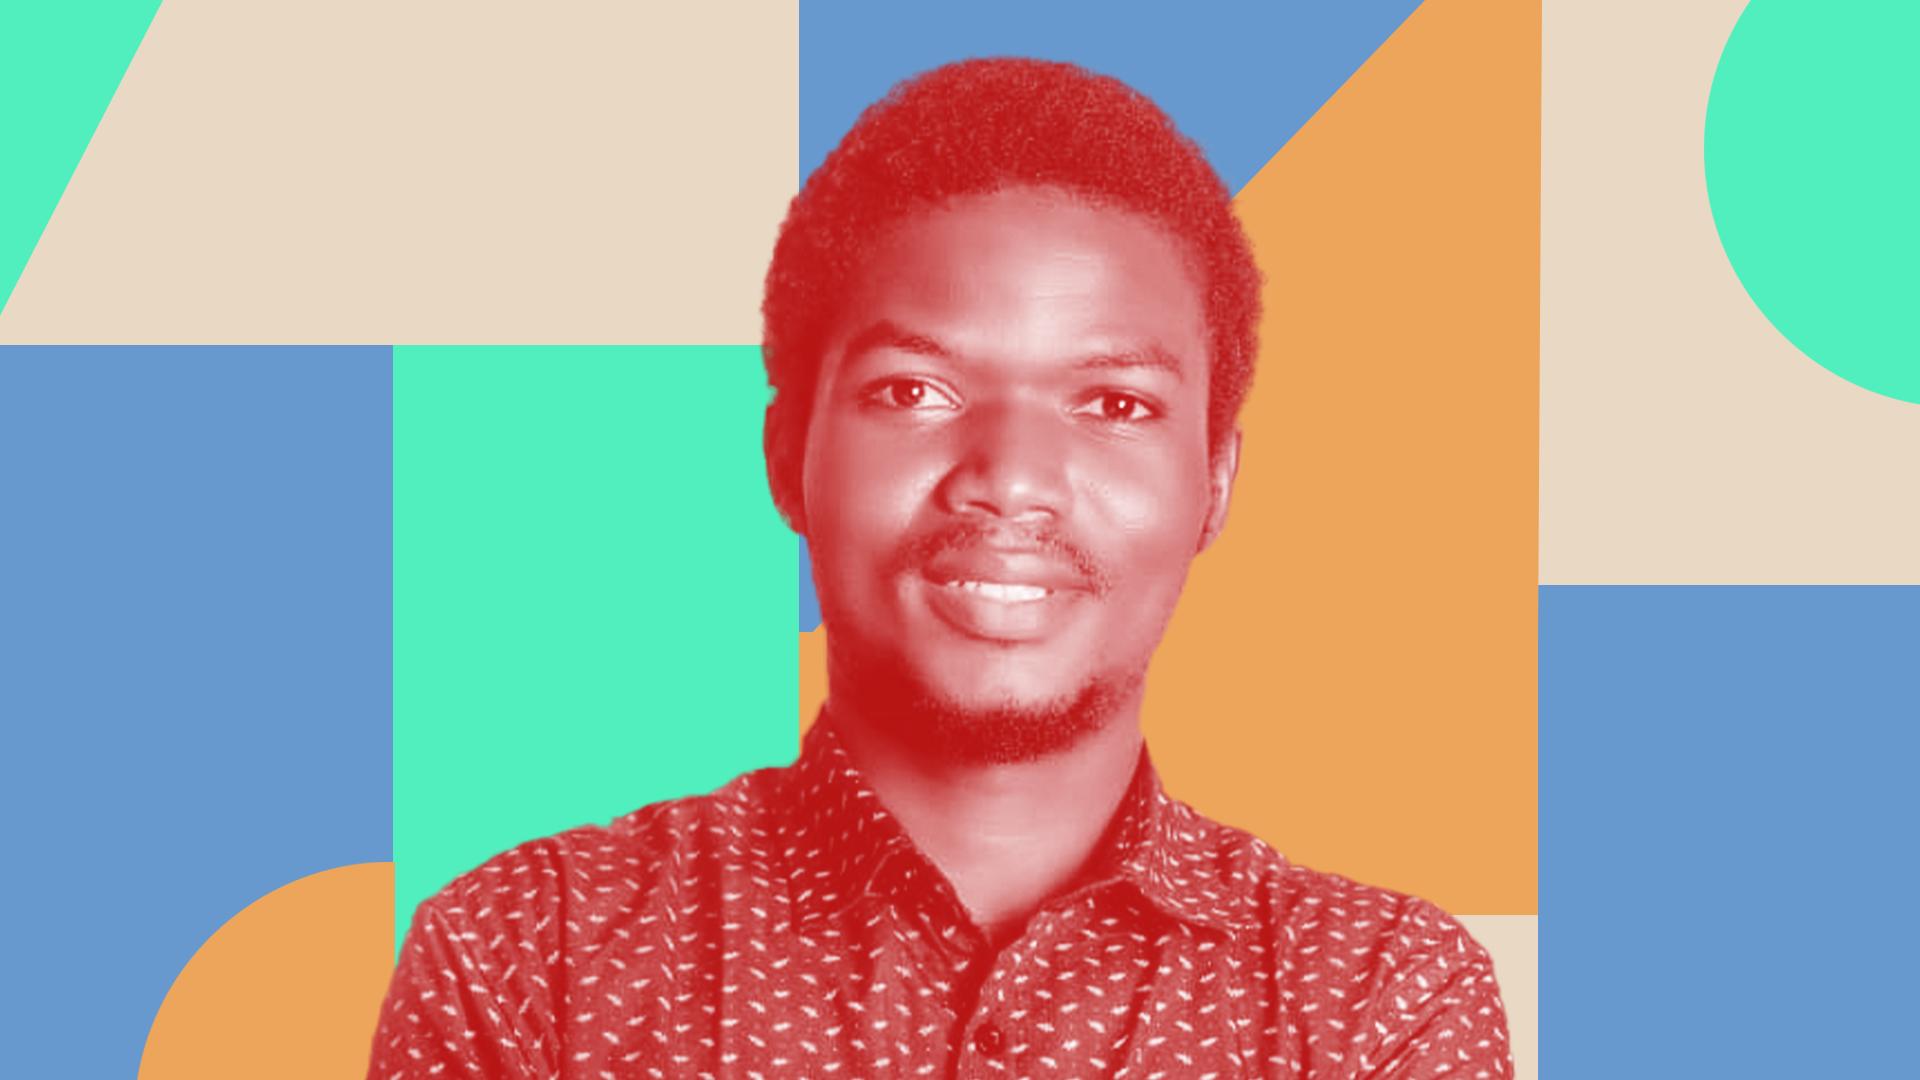 LeGavel, Kingsley Owadara